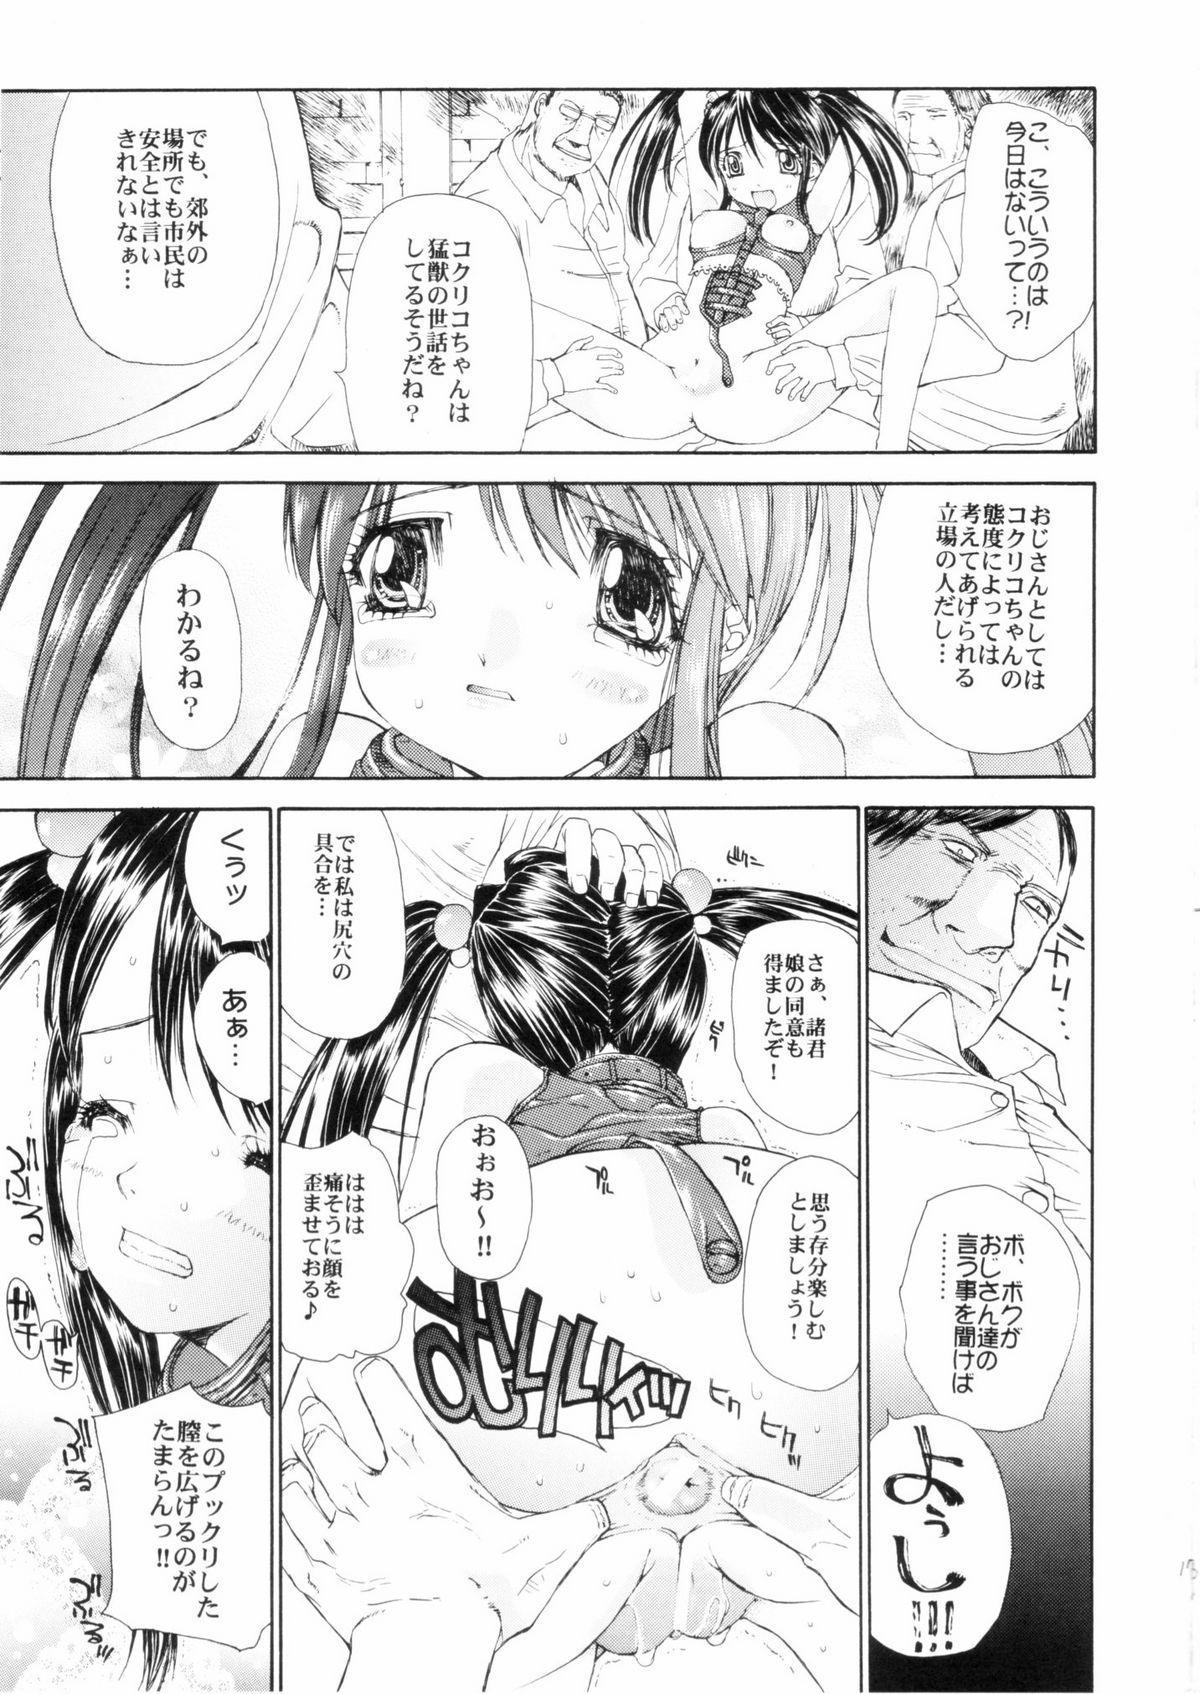 Zoku Tennen Shoujo 15